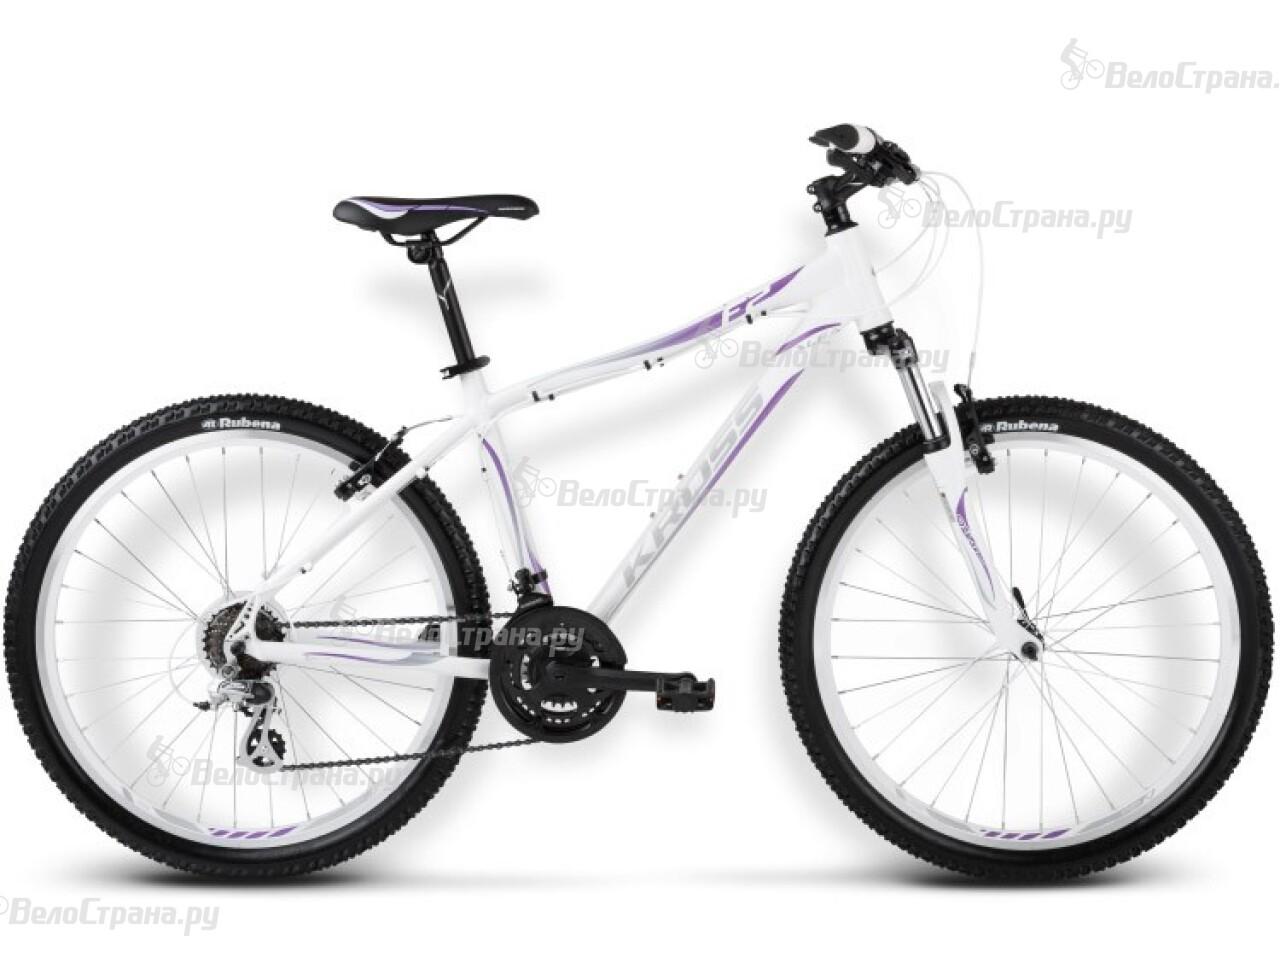 Велосипед Kross Lea F2 (2015) велосипед kross lea f4 2016